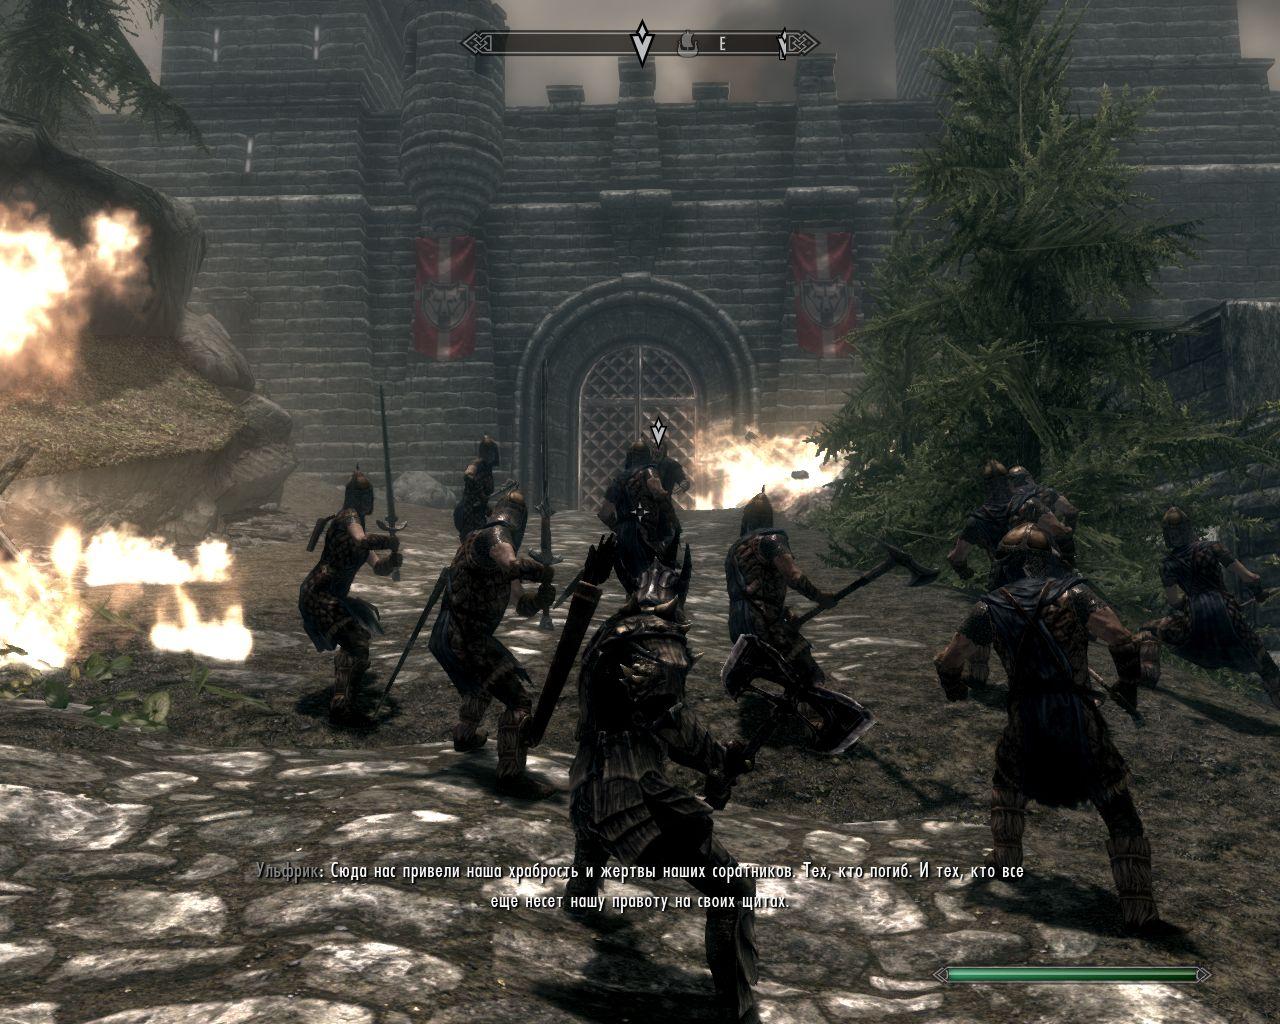 ScreenShot253.jpg - Elder Scrolls 5: Skyrim, the